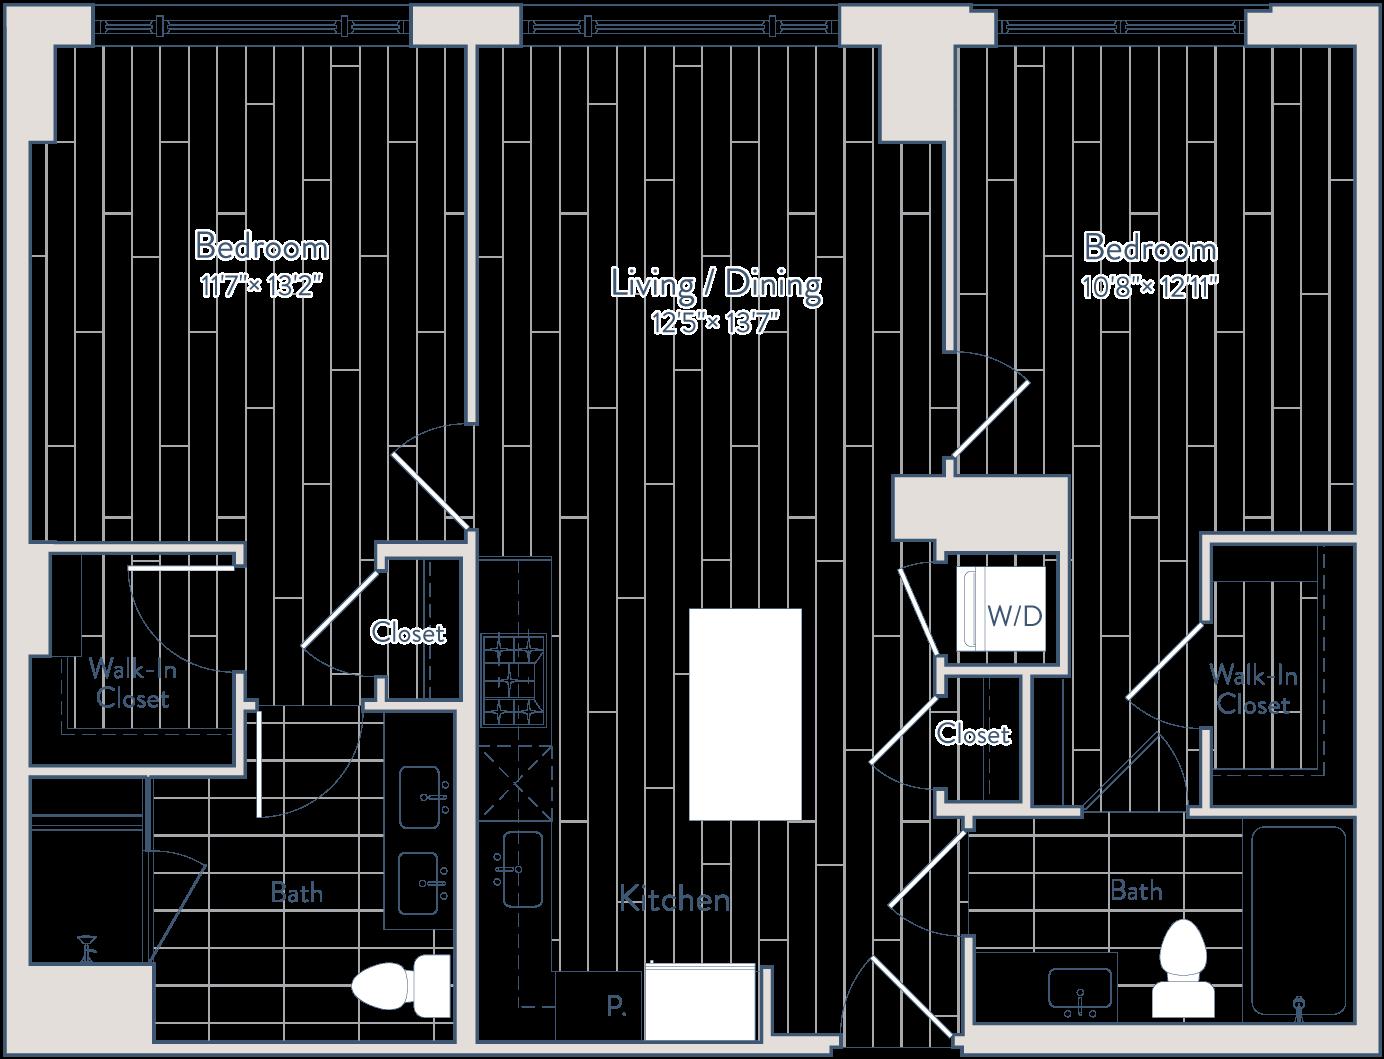 Floor plan of apartment 1111